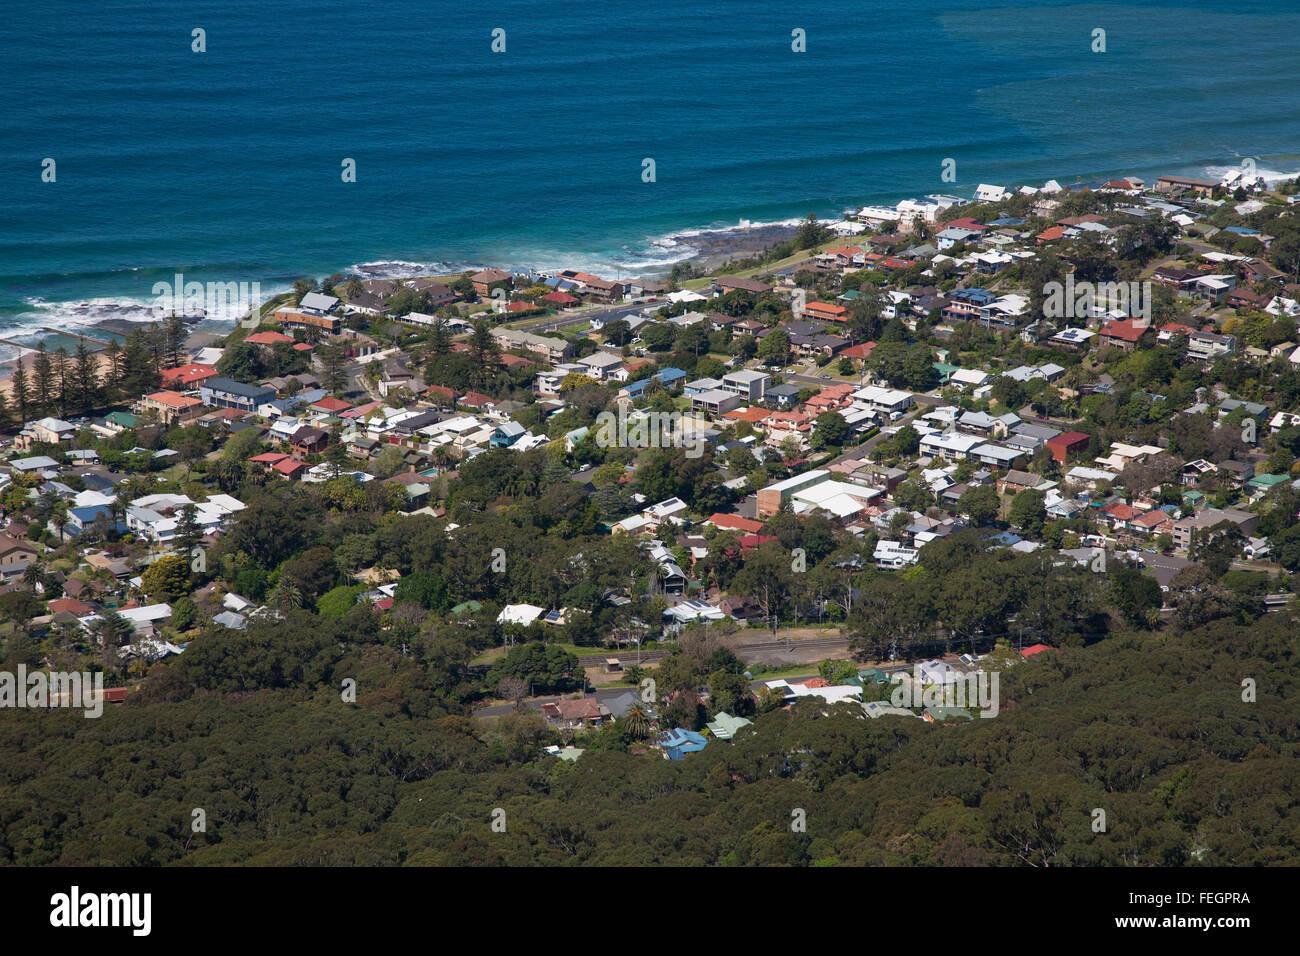 Urban coastal development around the Wollongong region NSW Australia - Stock Image